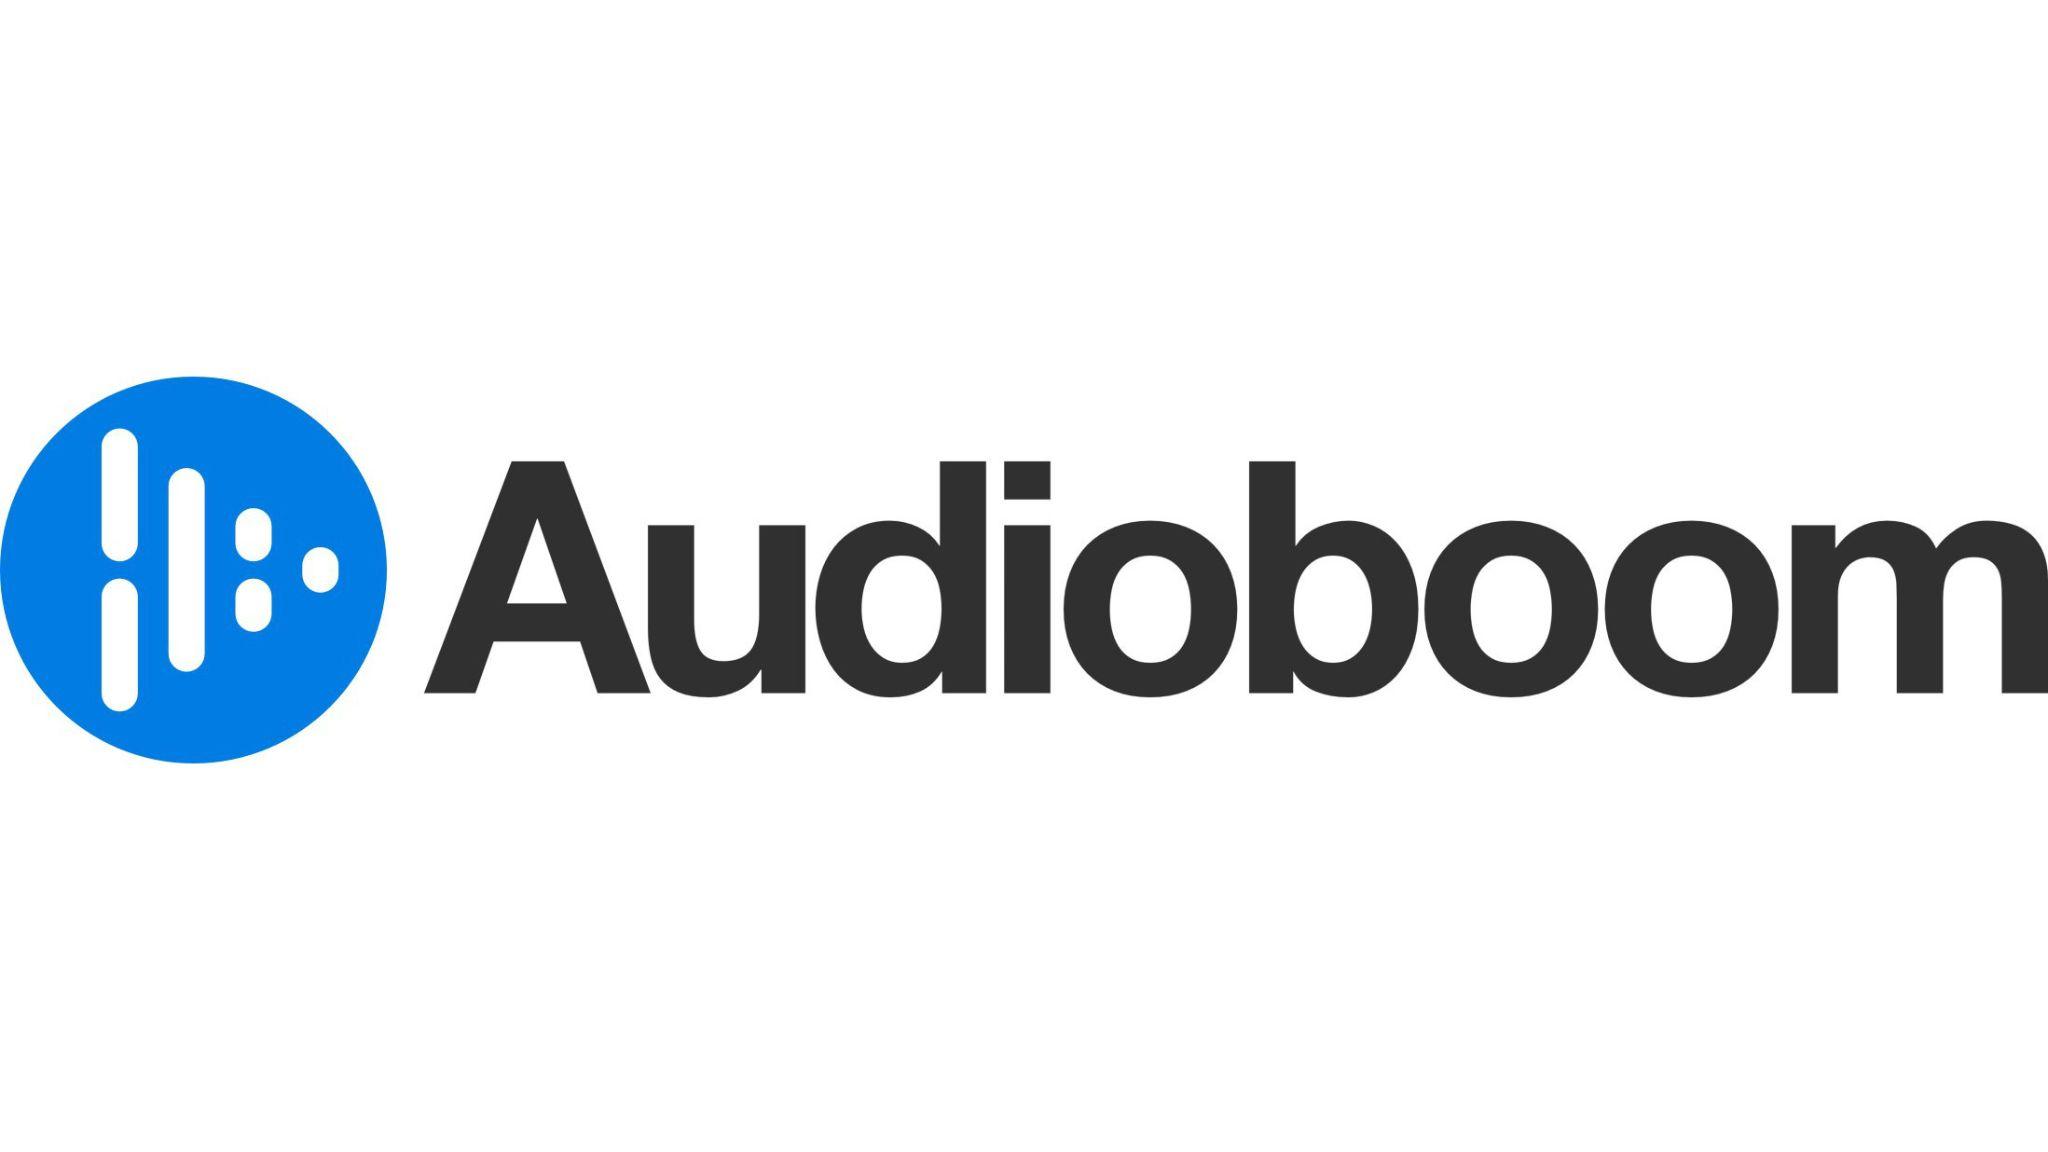 See the Best Podcast Hosting Platforms